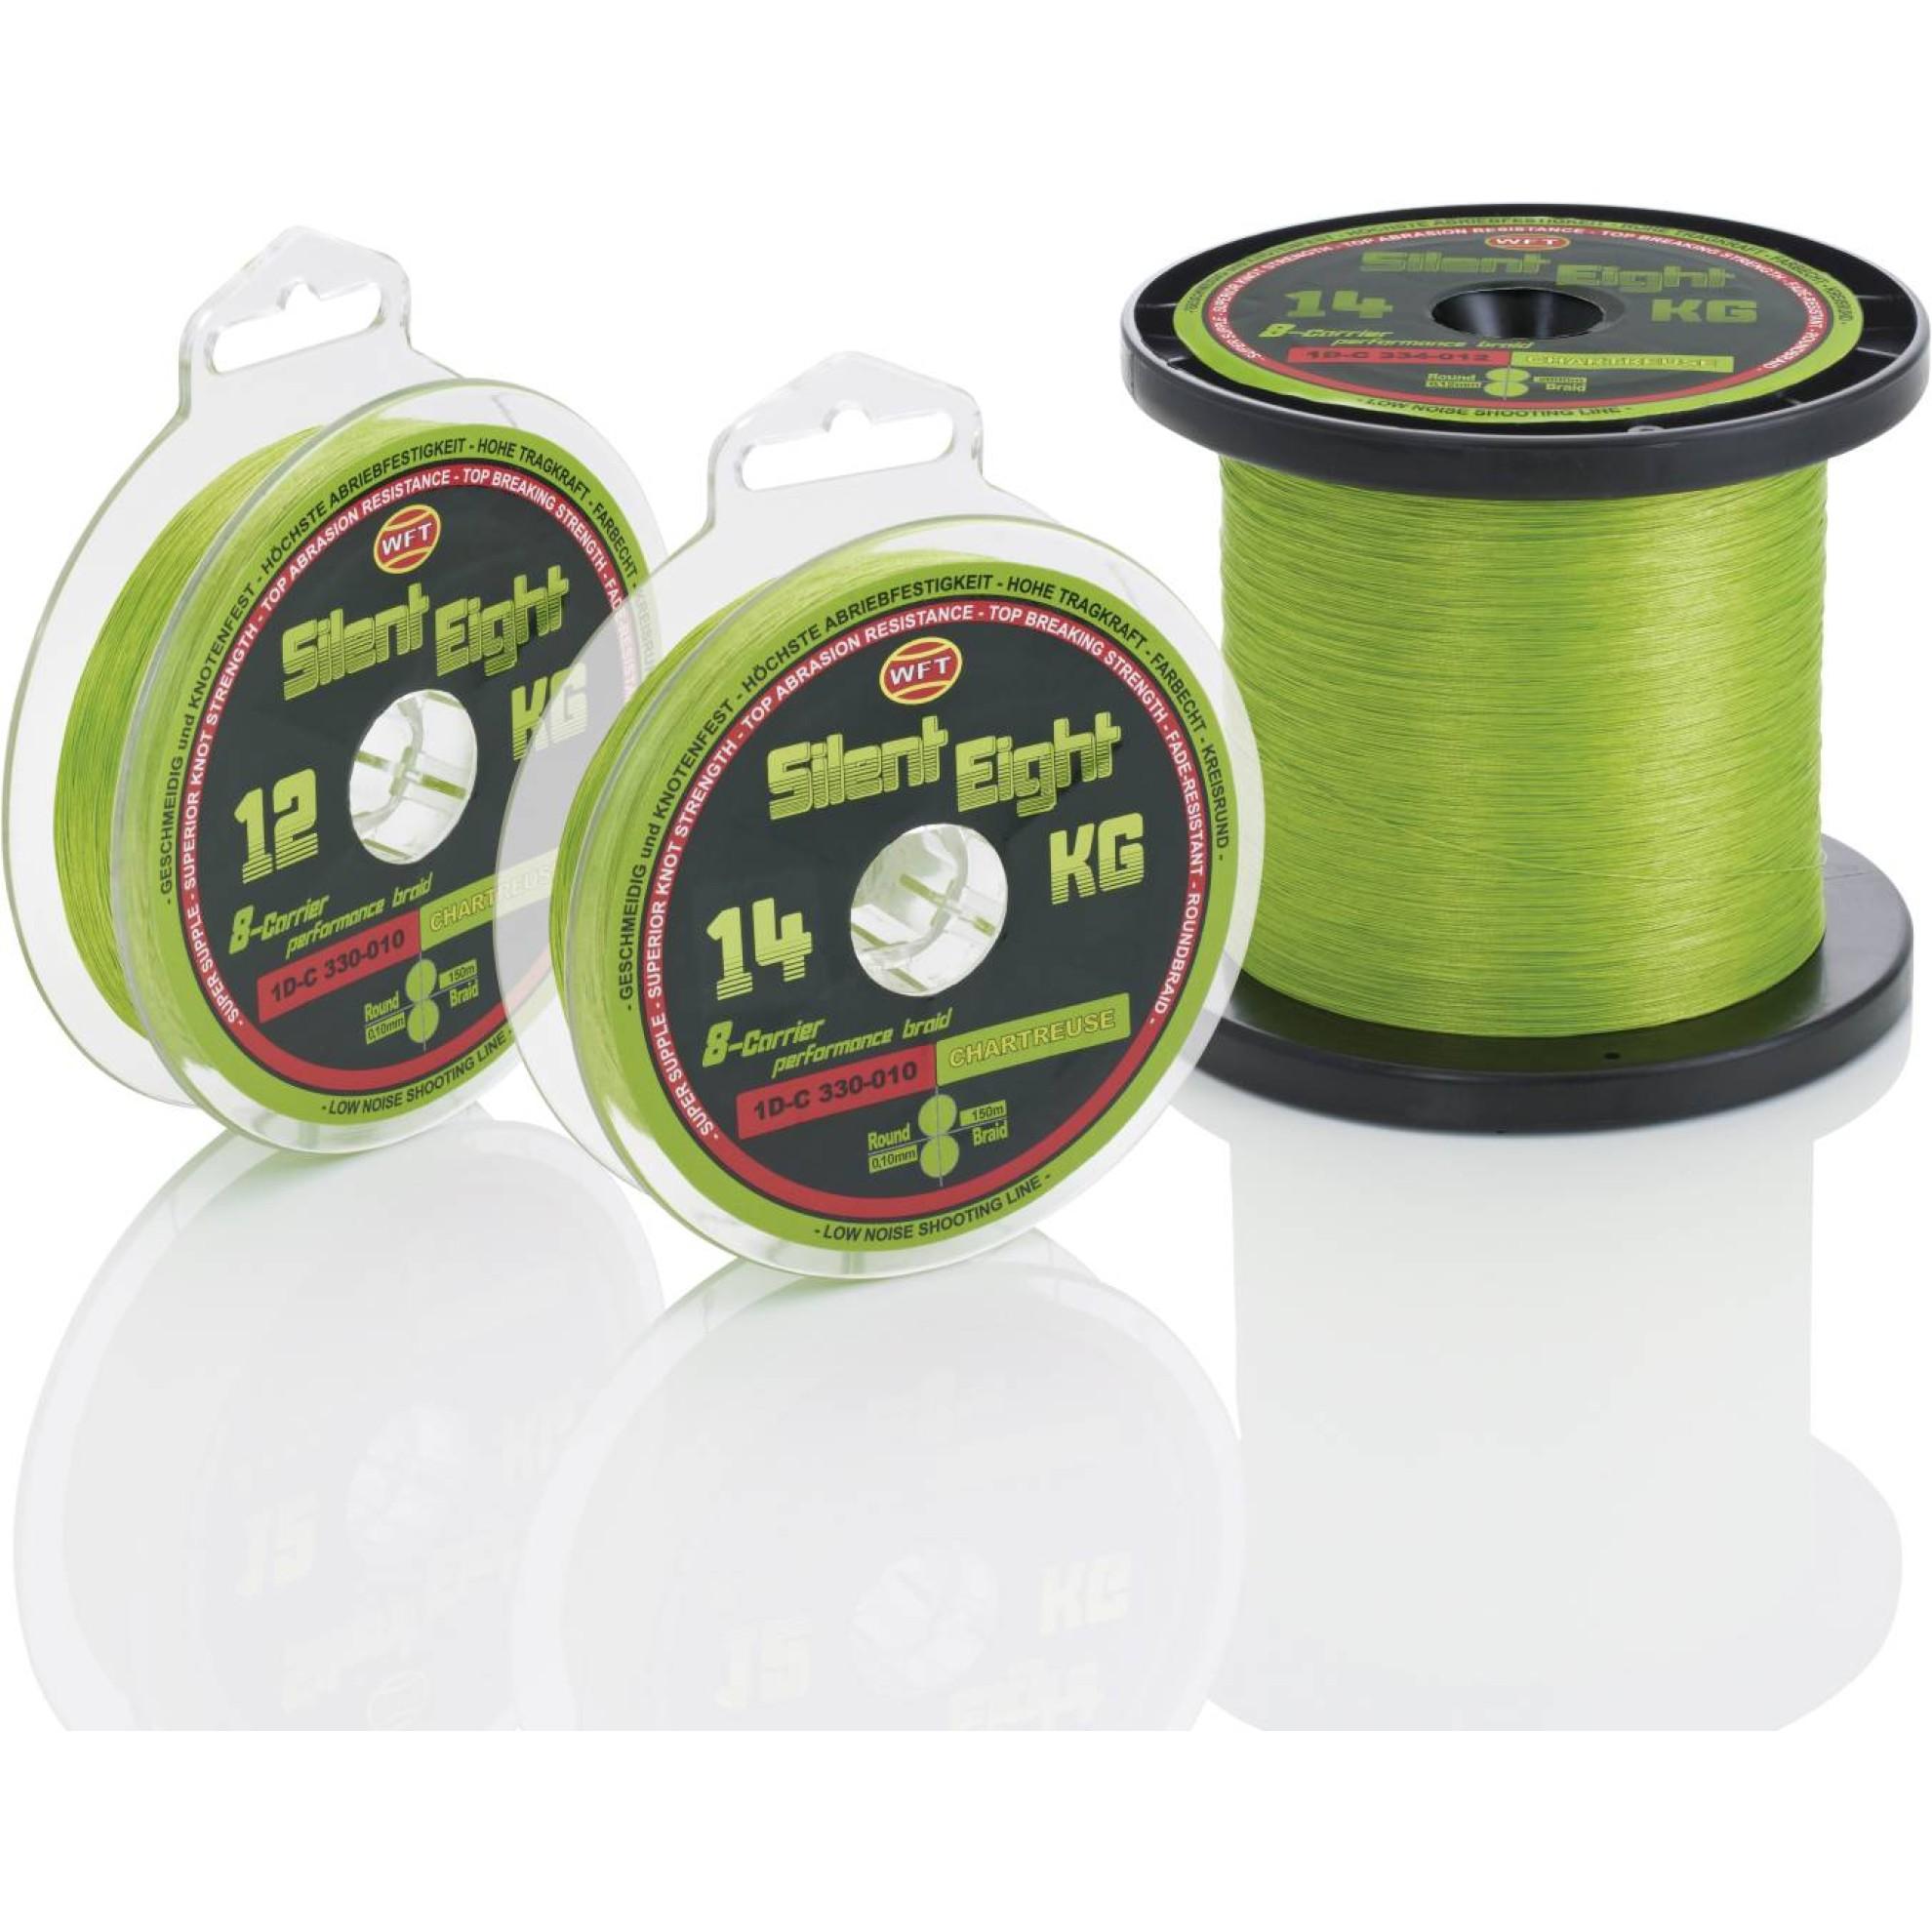 Silent 8 chartreuse 150m, 23KG, 0.18mm